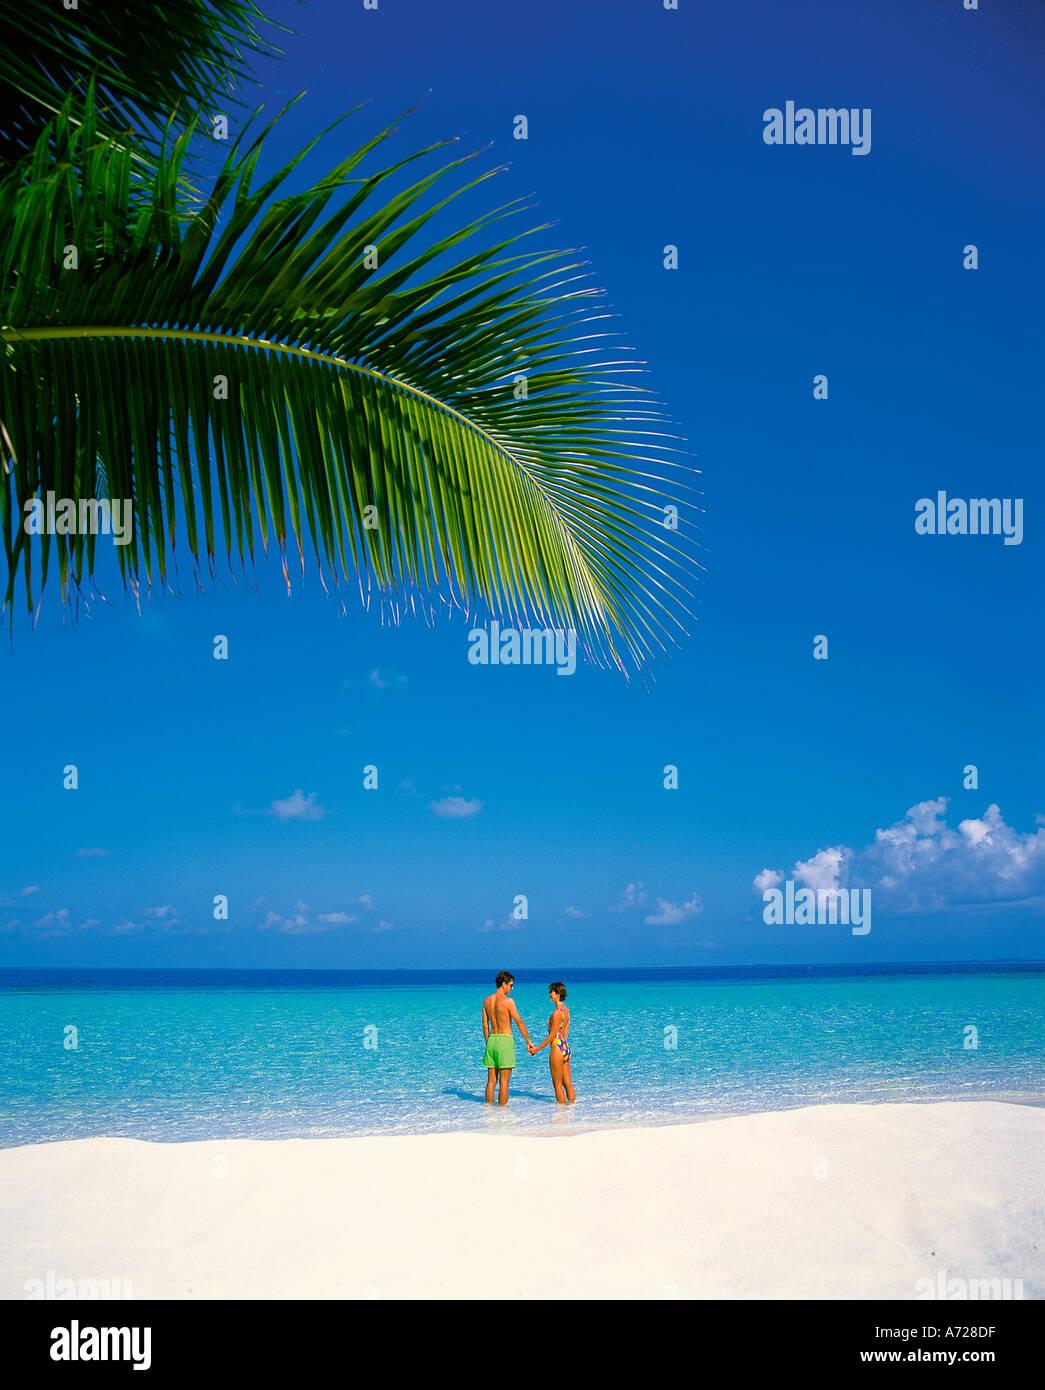 Couple On Tropical Island Beach At Ari Atoll Maldive Islands Indian